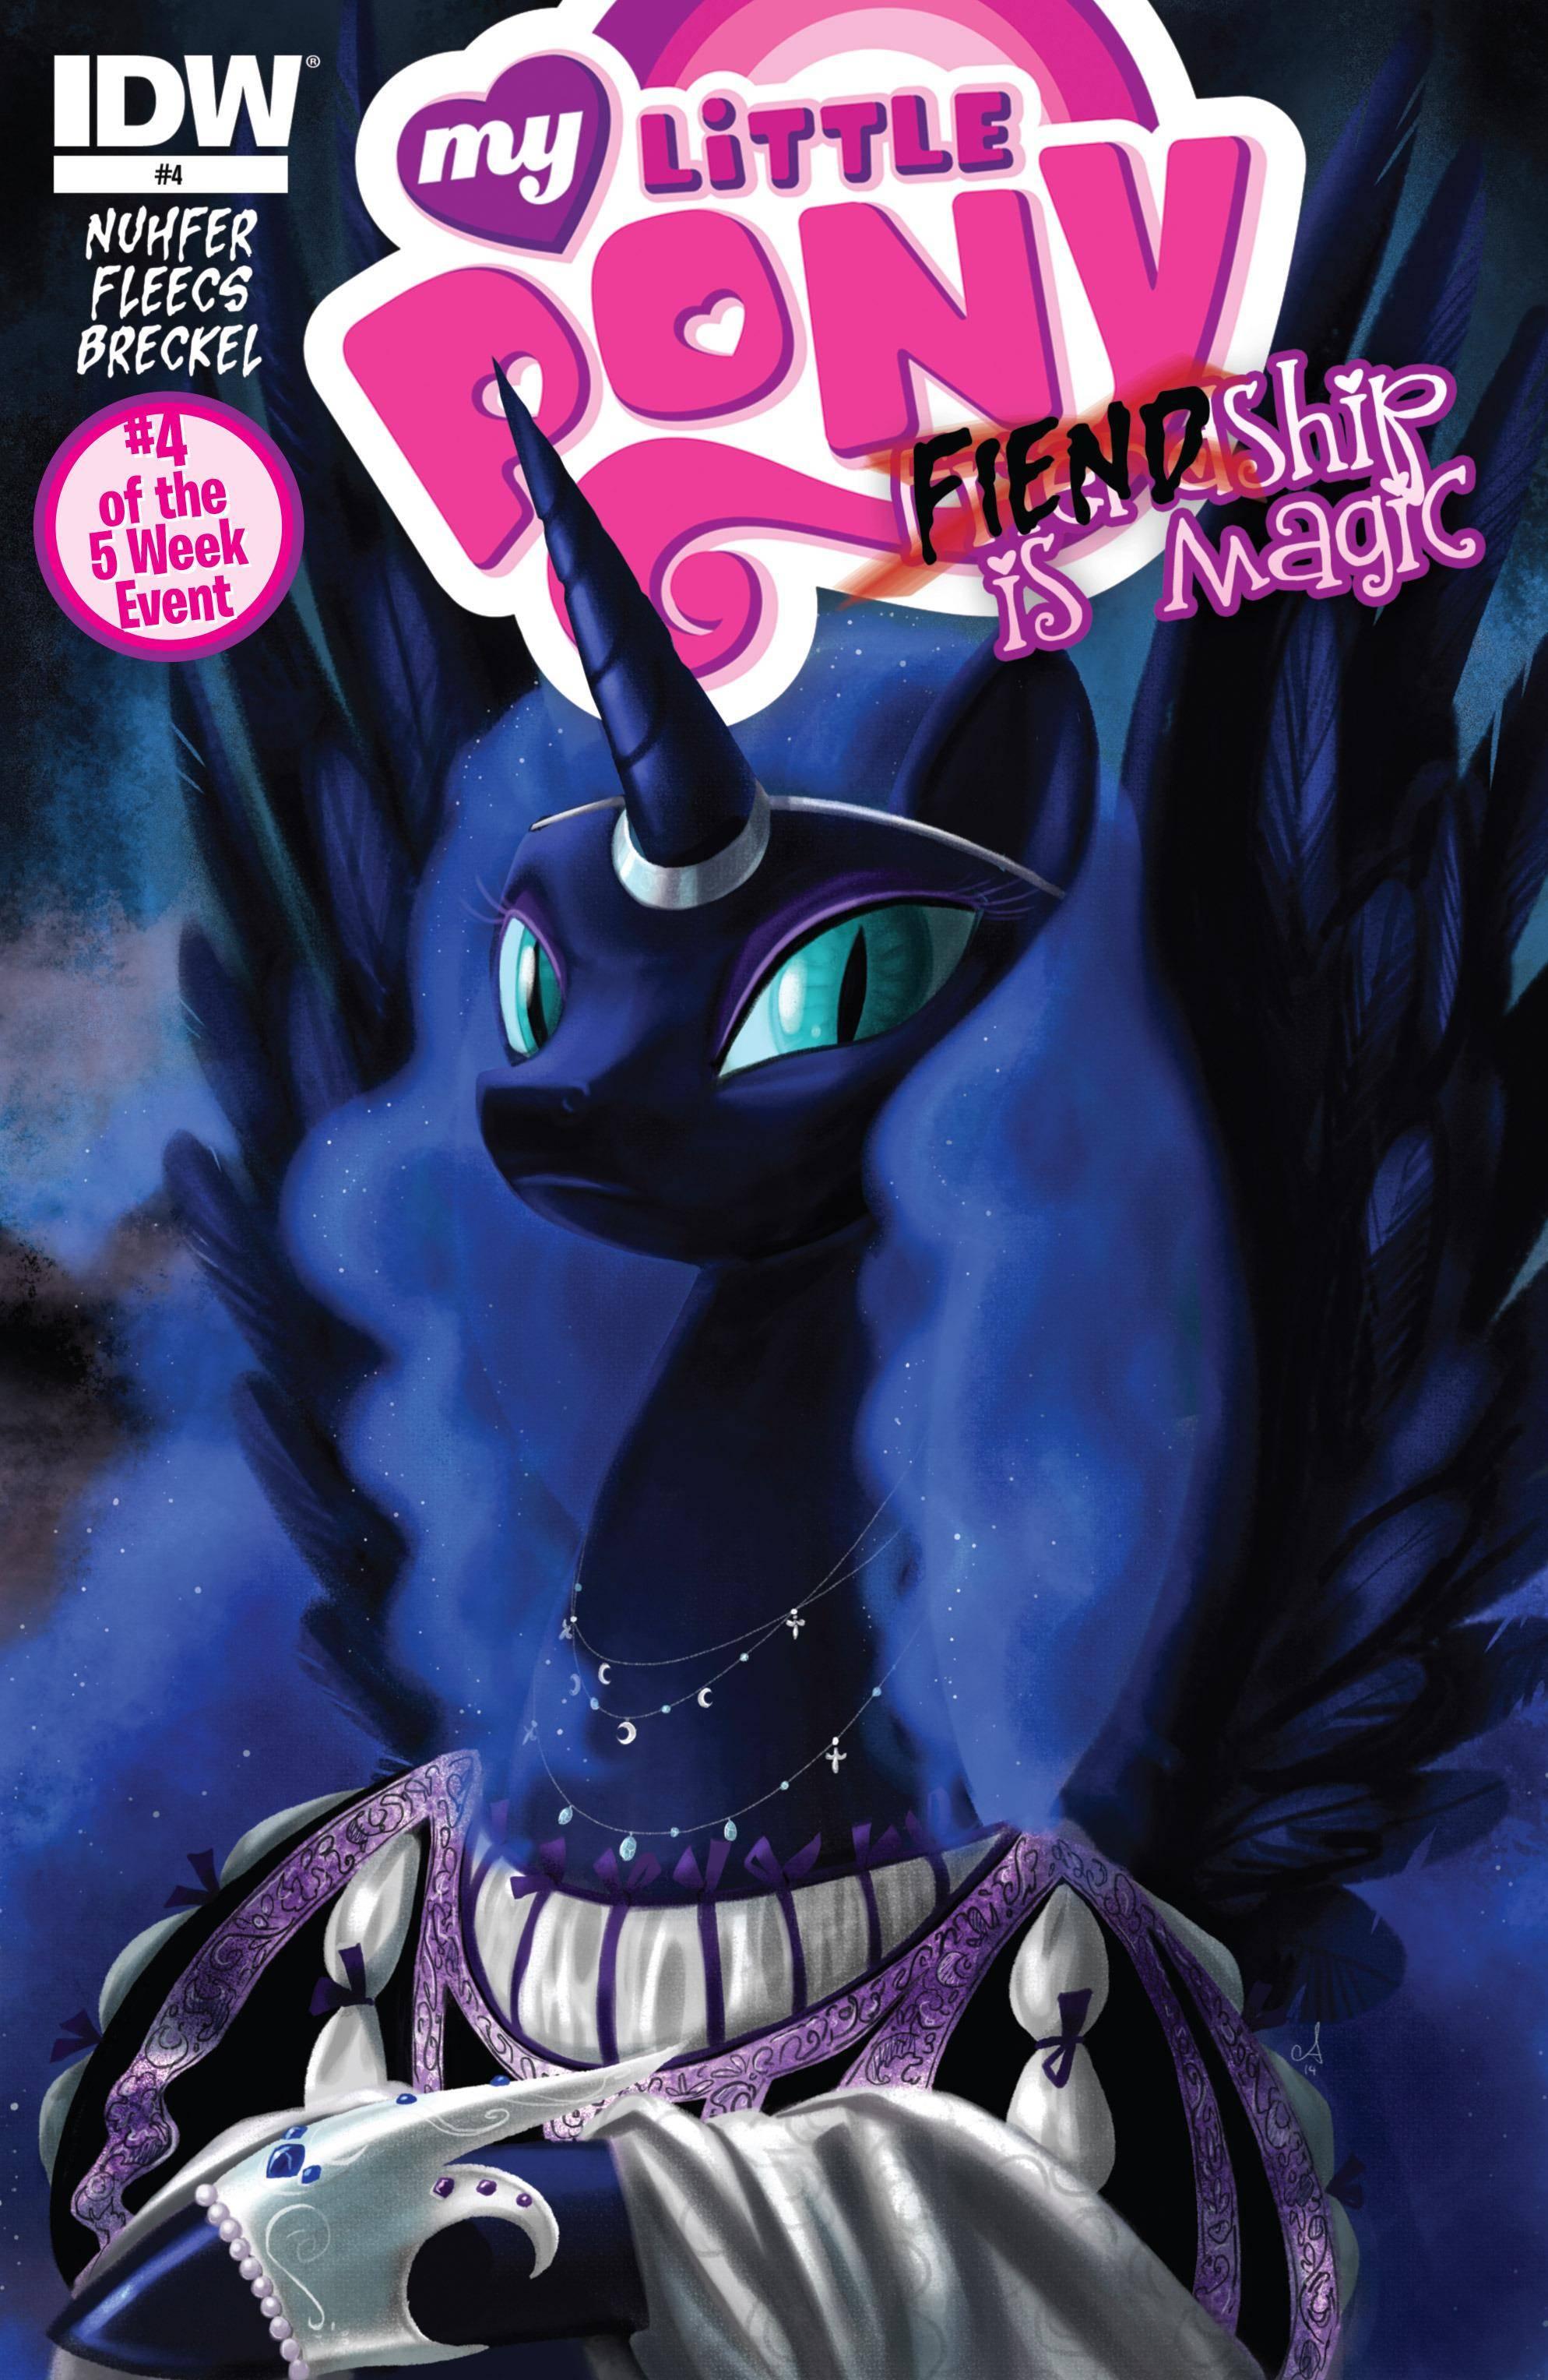 My Little Pony- FIENDship is Magic 004 - Nightmare Moon 2015 digital